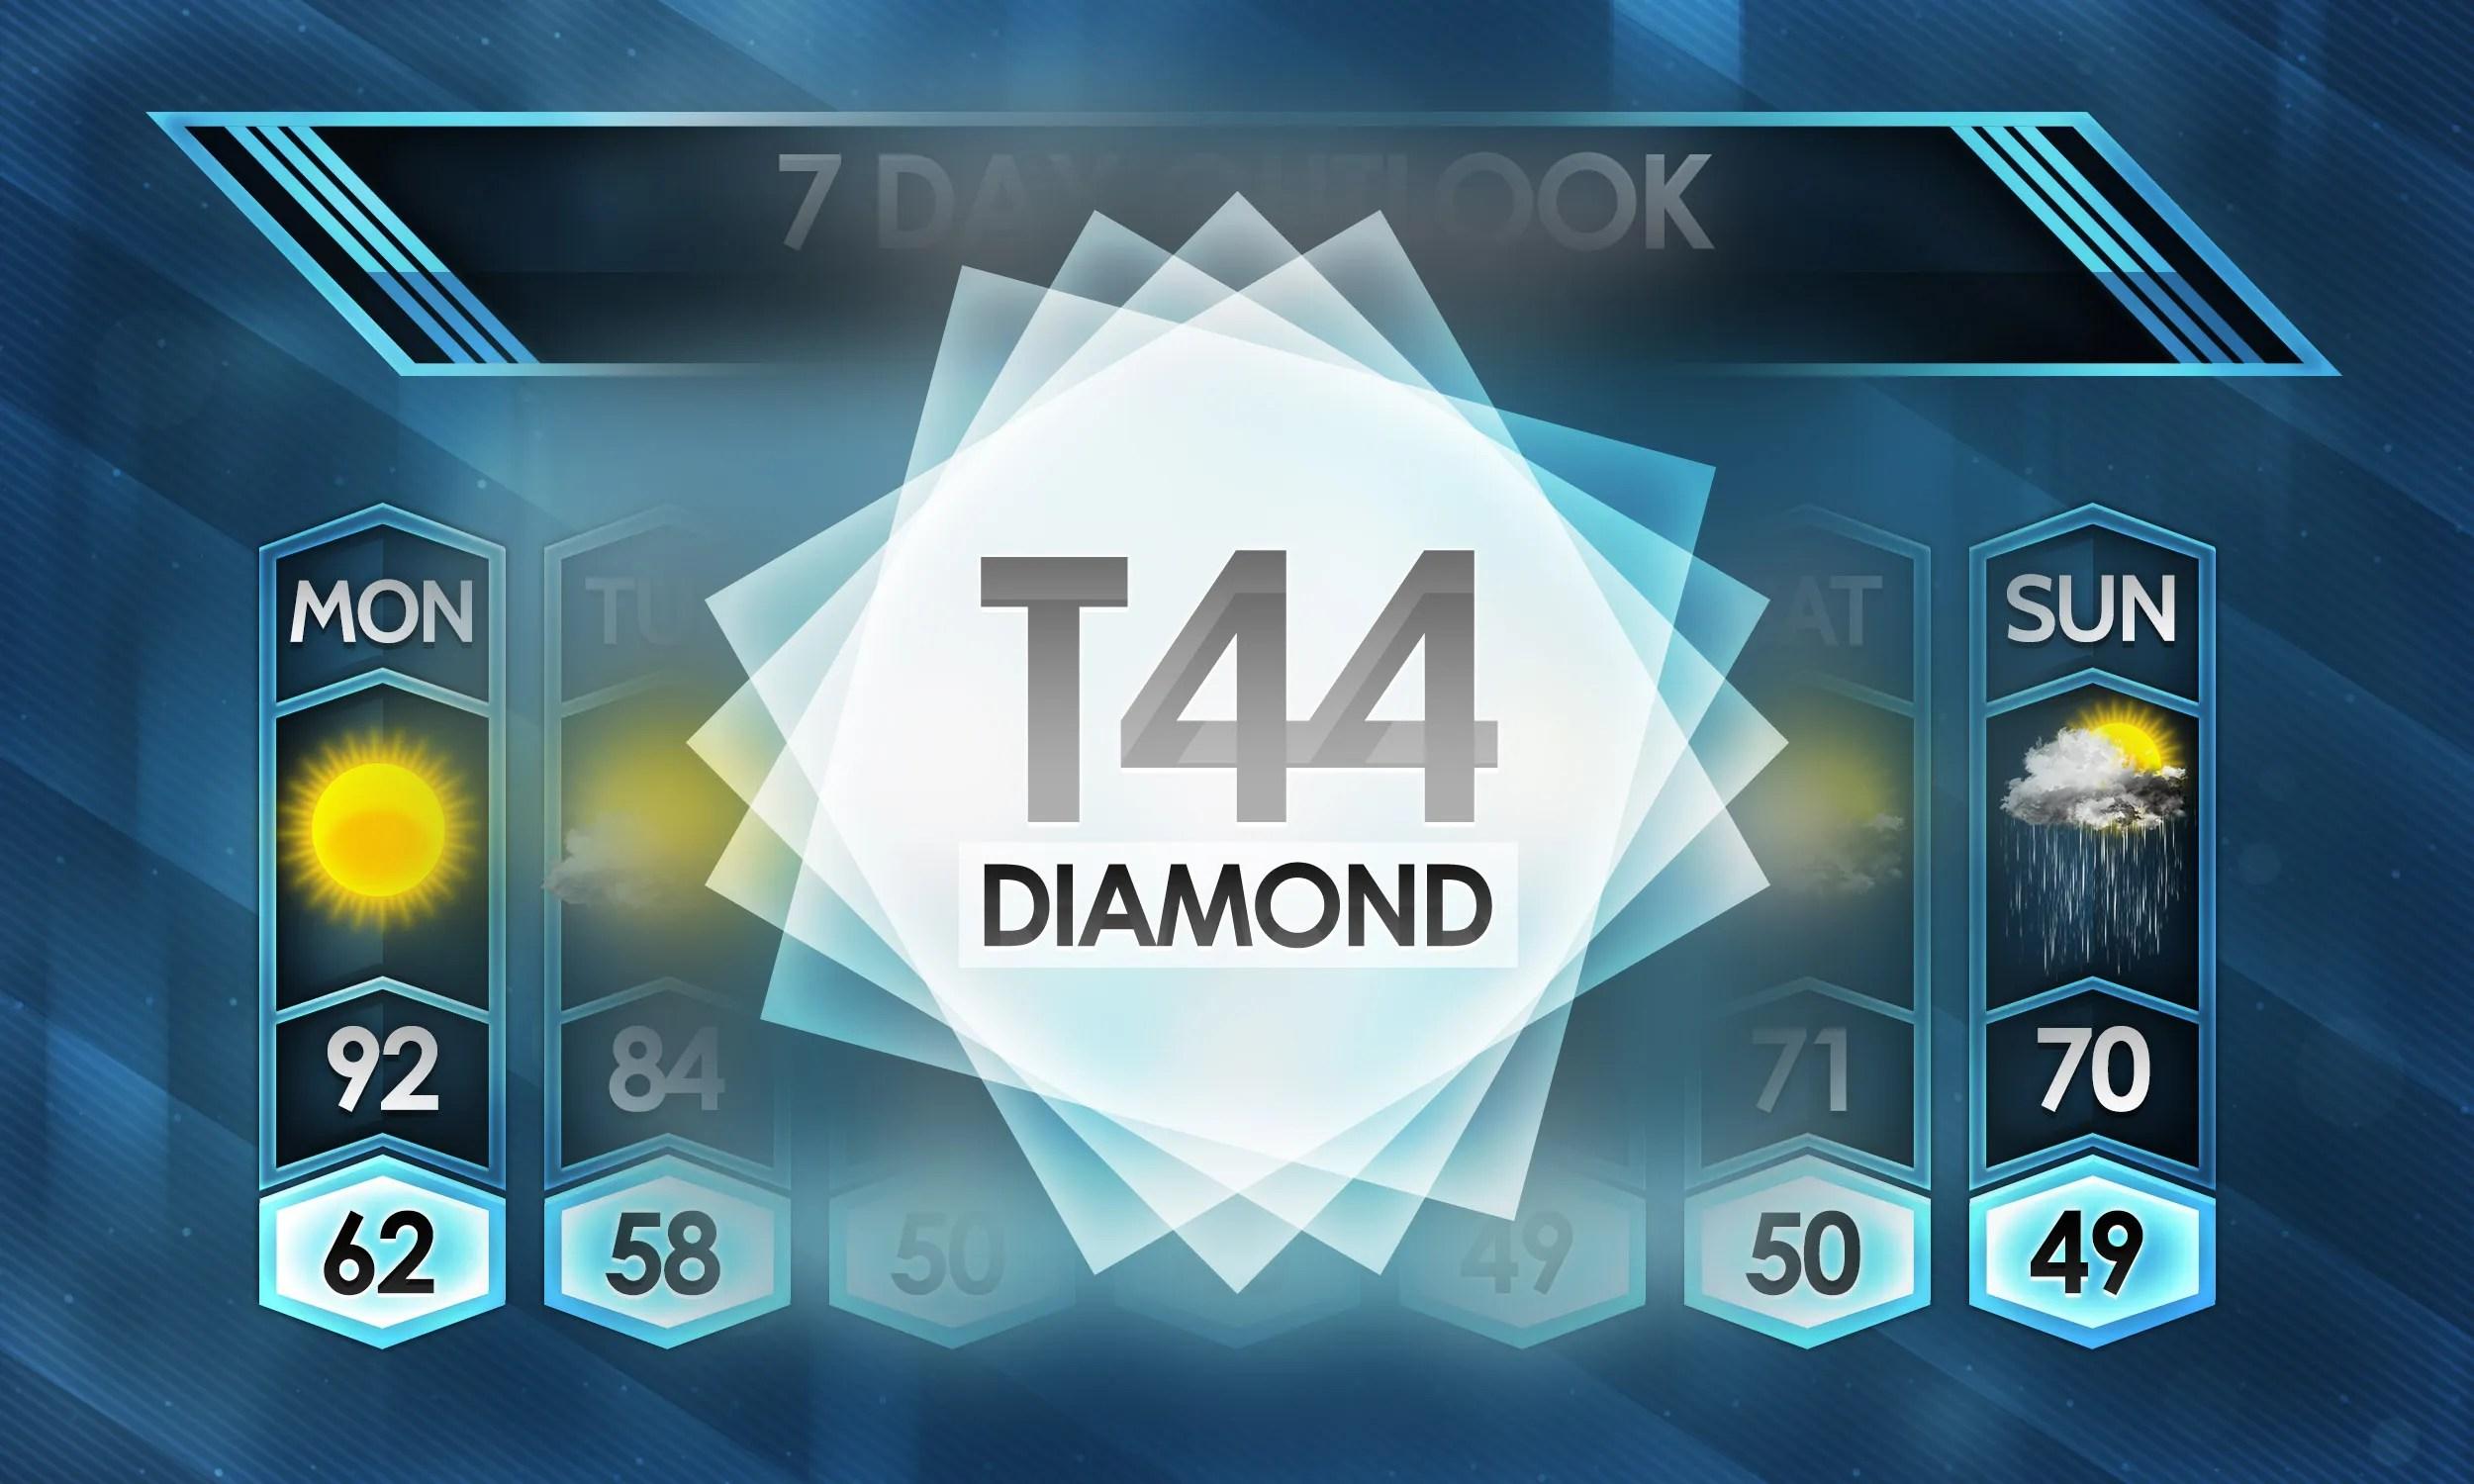 t44 diamond